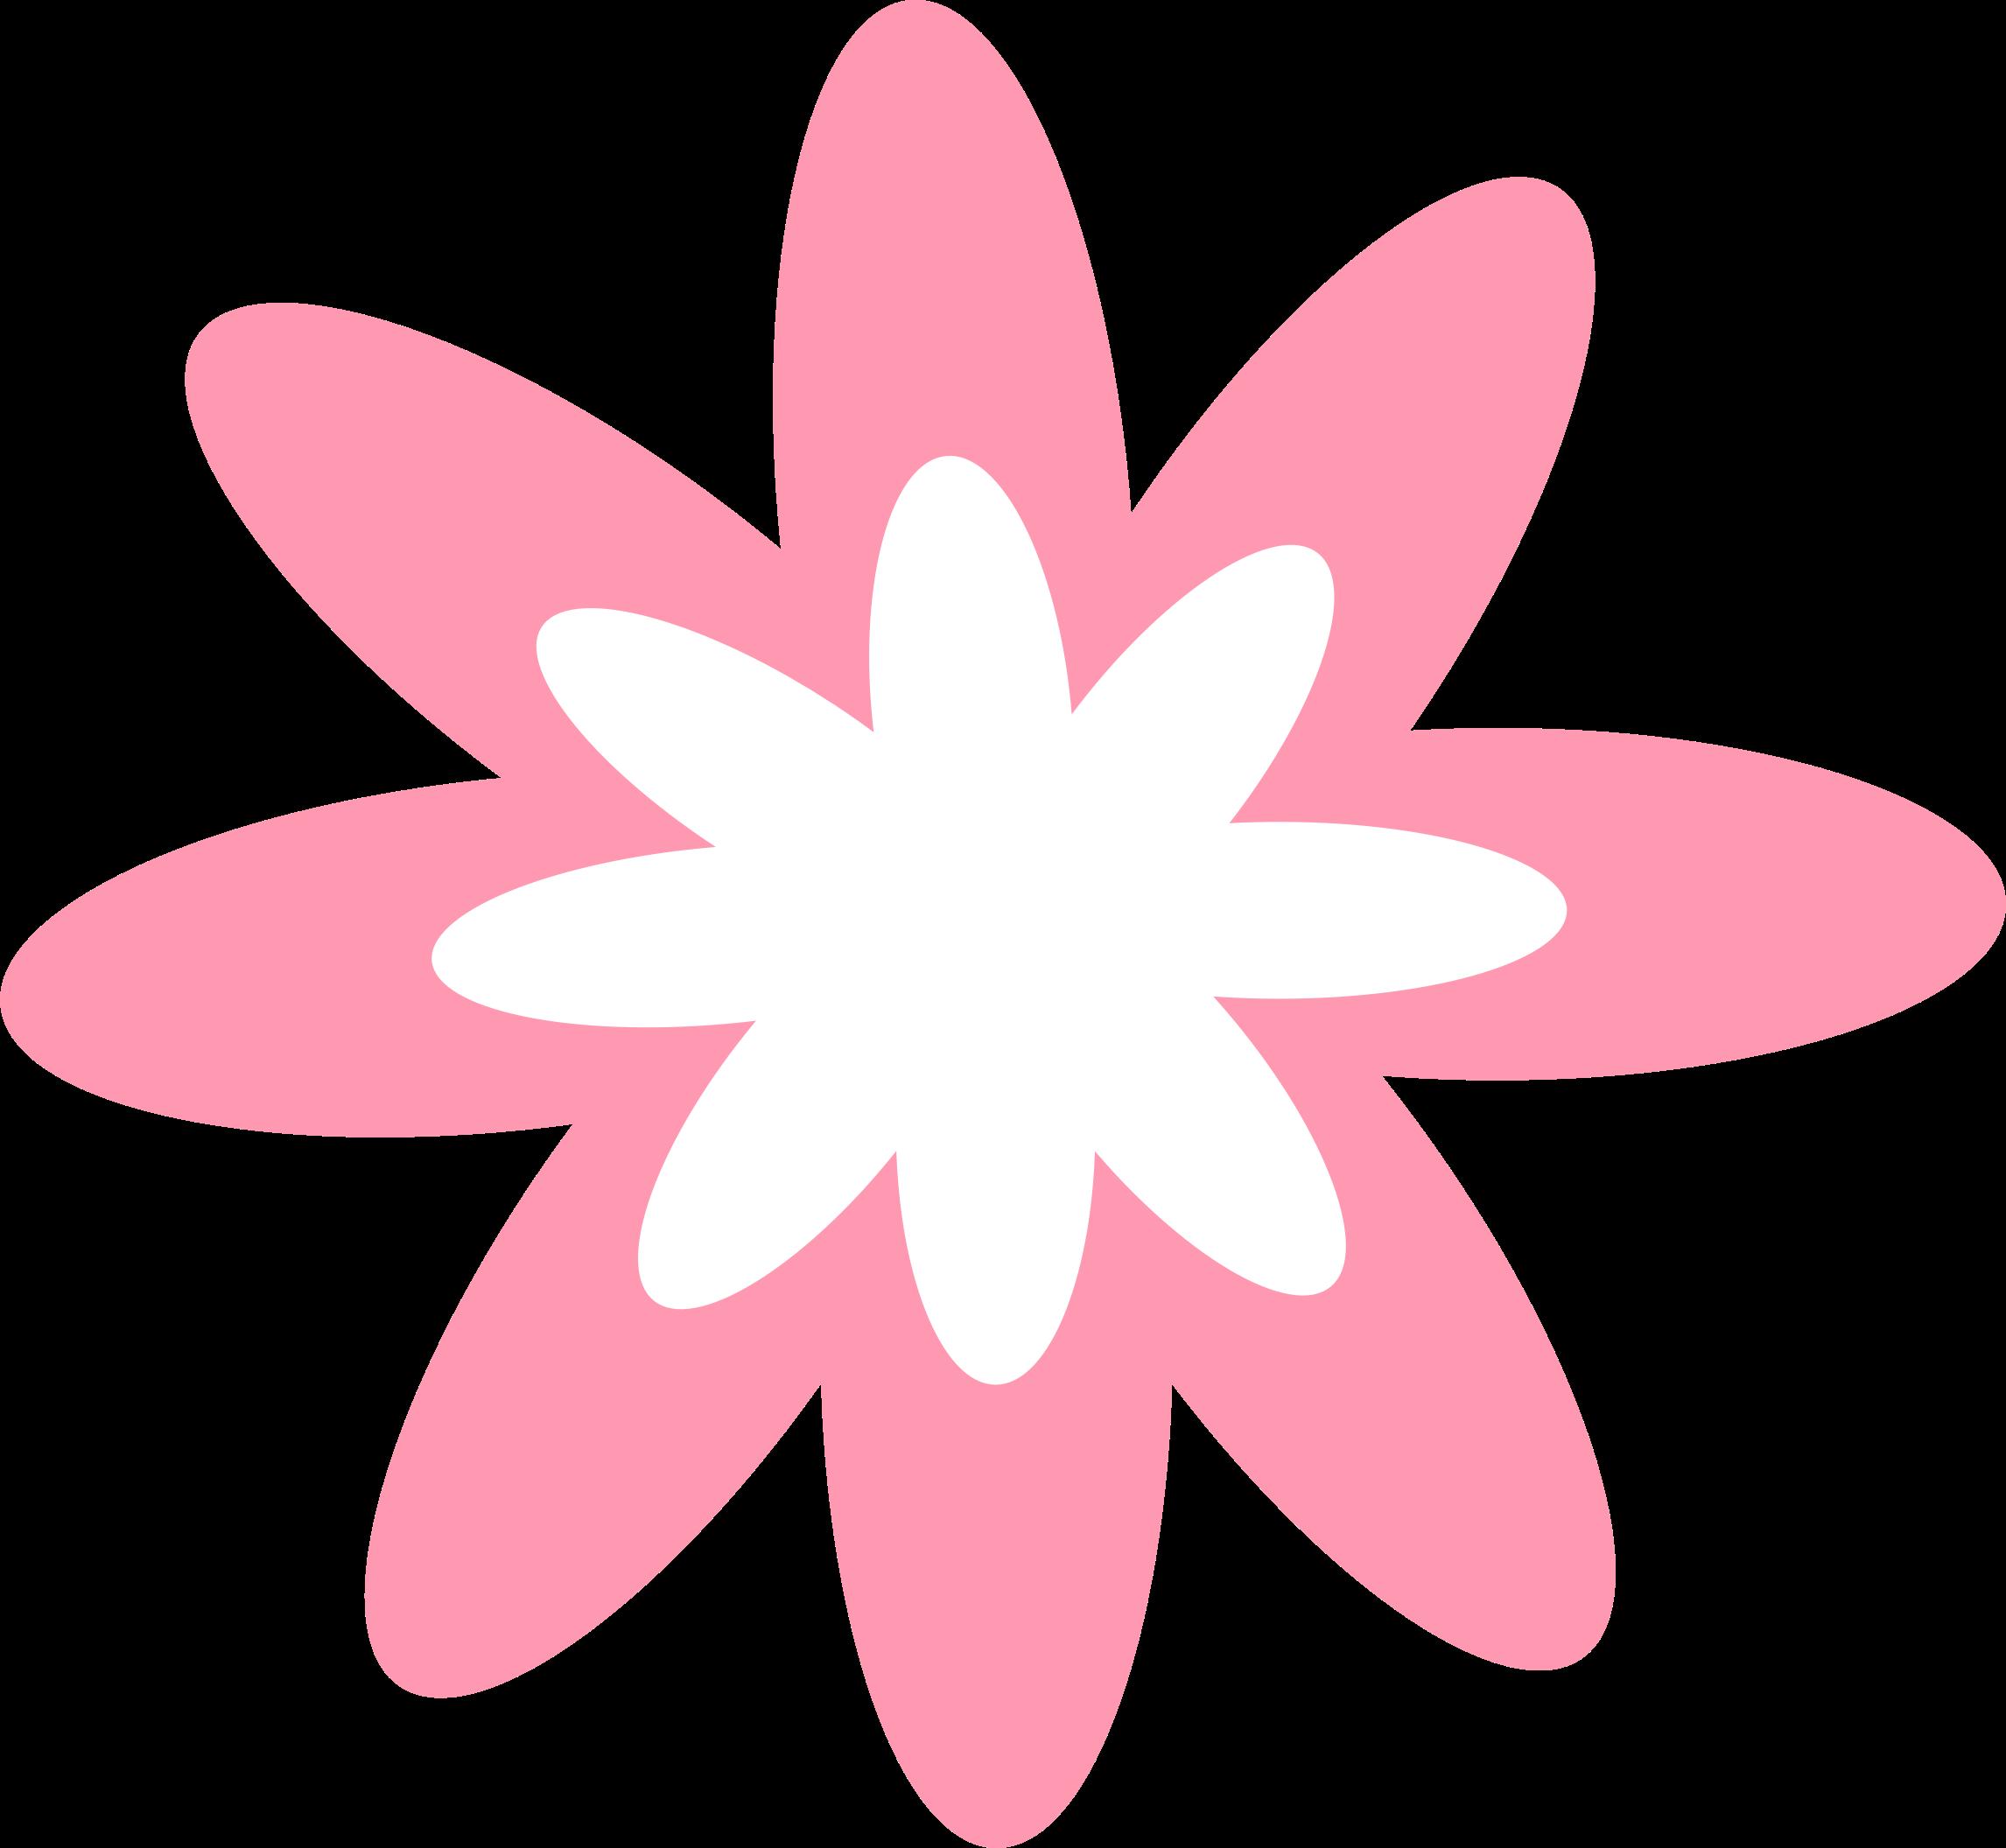 Burst flower icons png. Clipart design pink